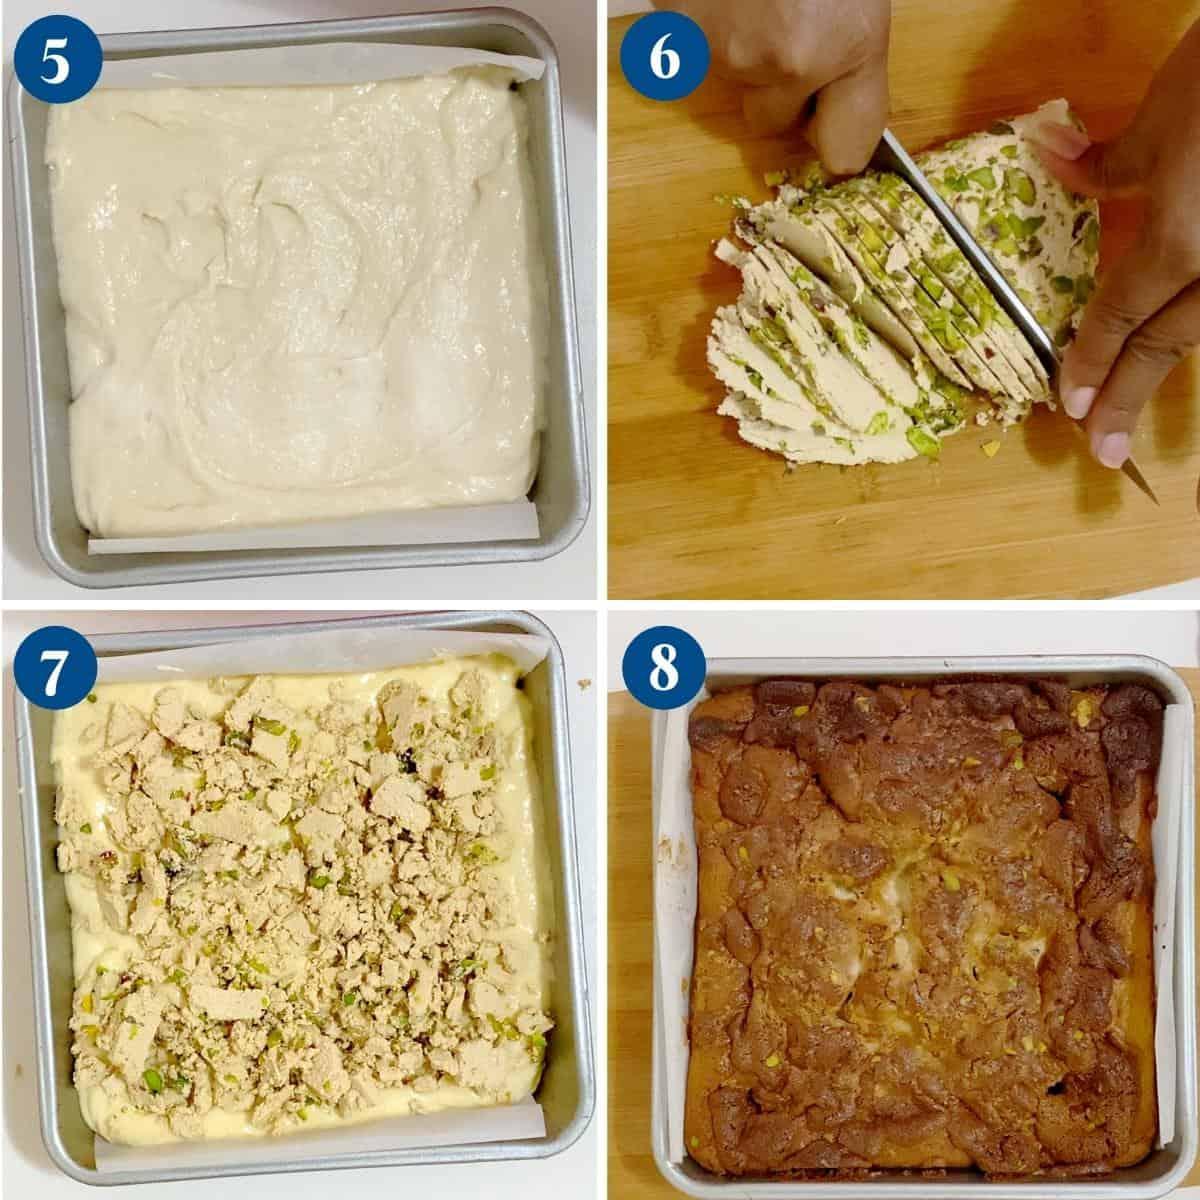 Progress pictures collage adding halva the cake.